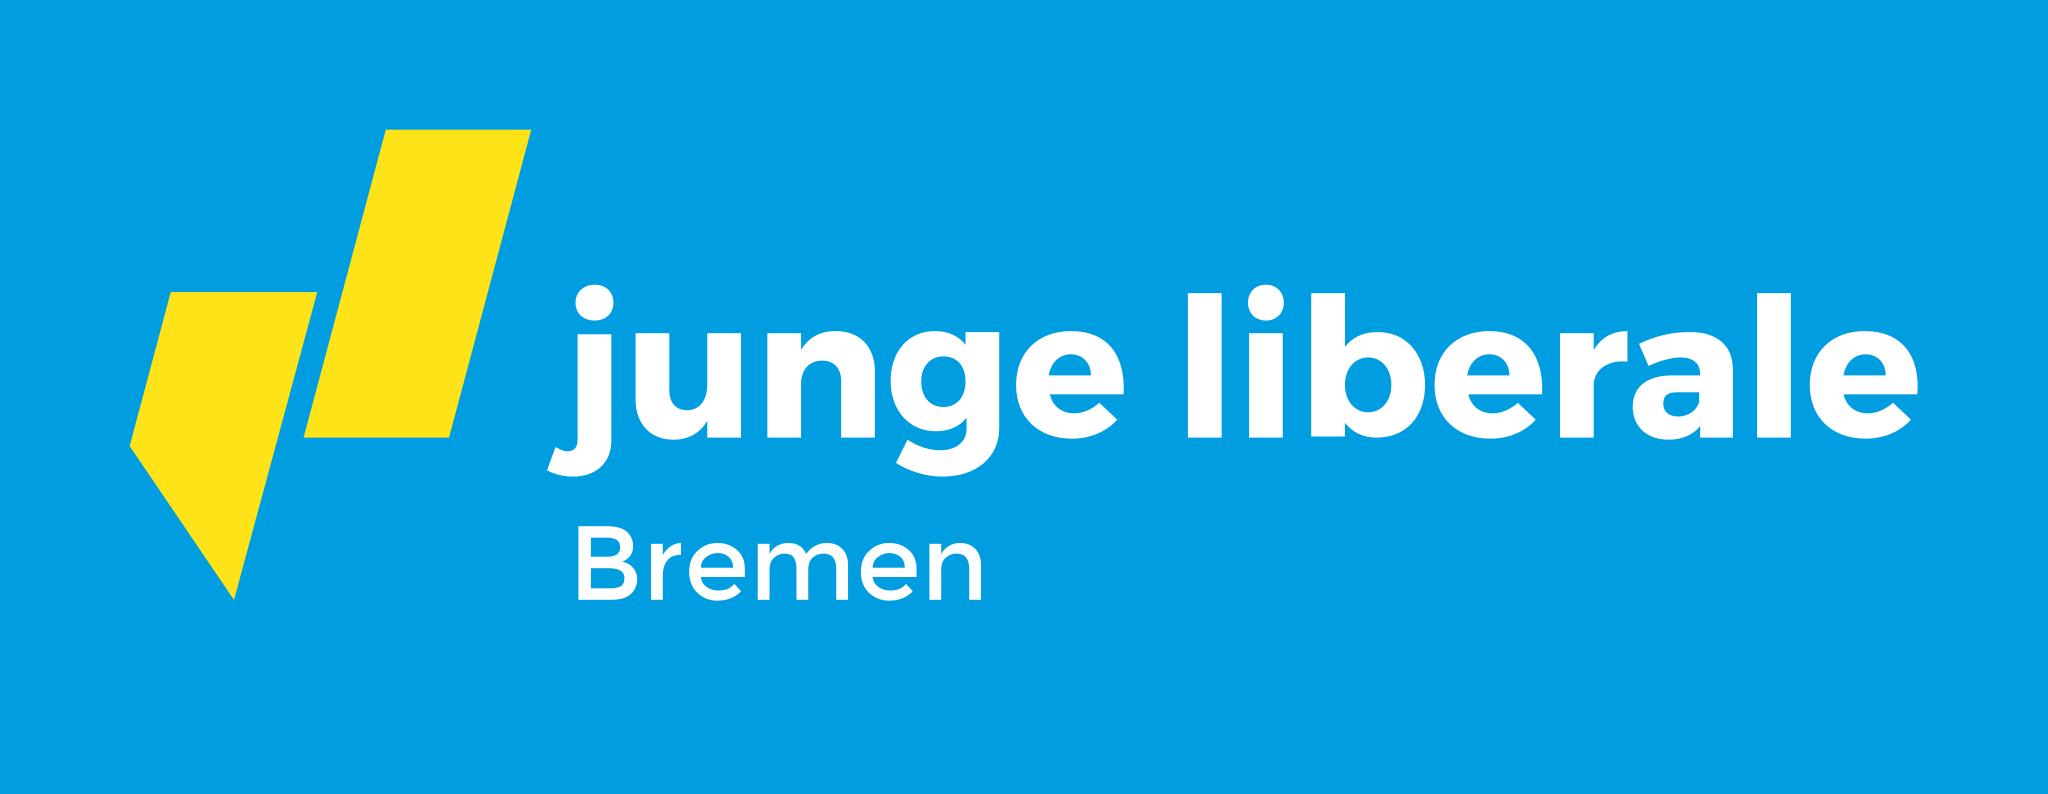 Junge Liberale Bremen